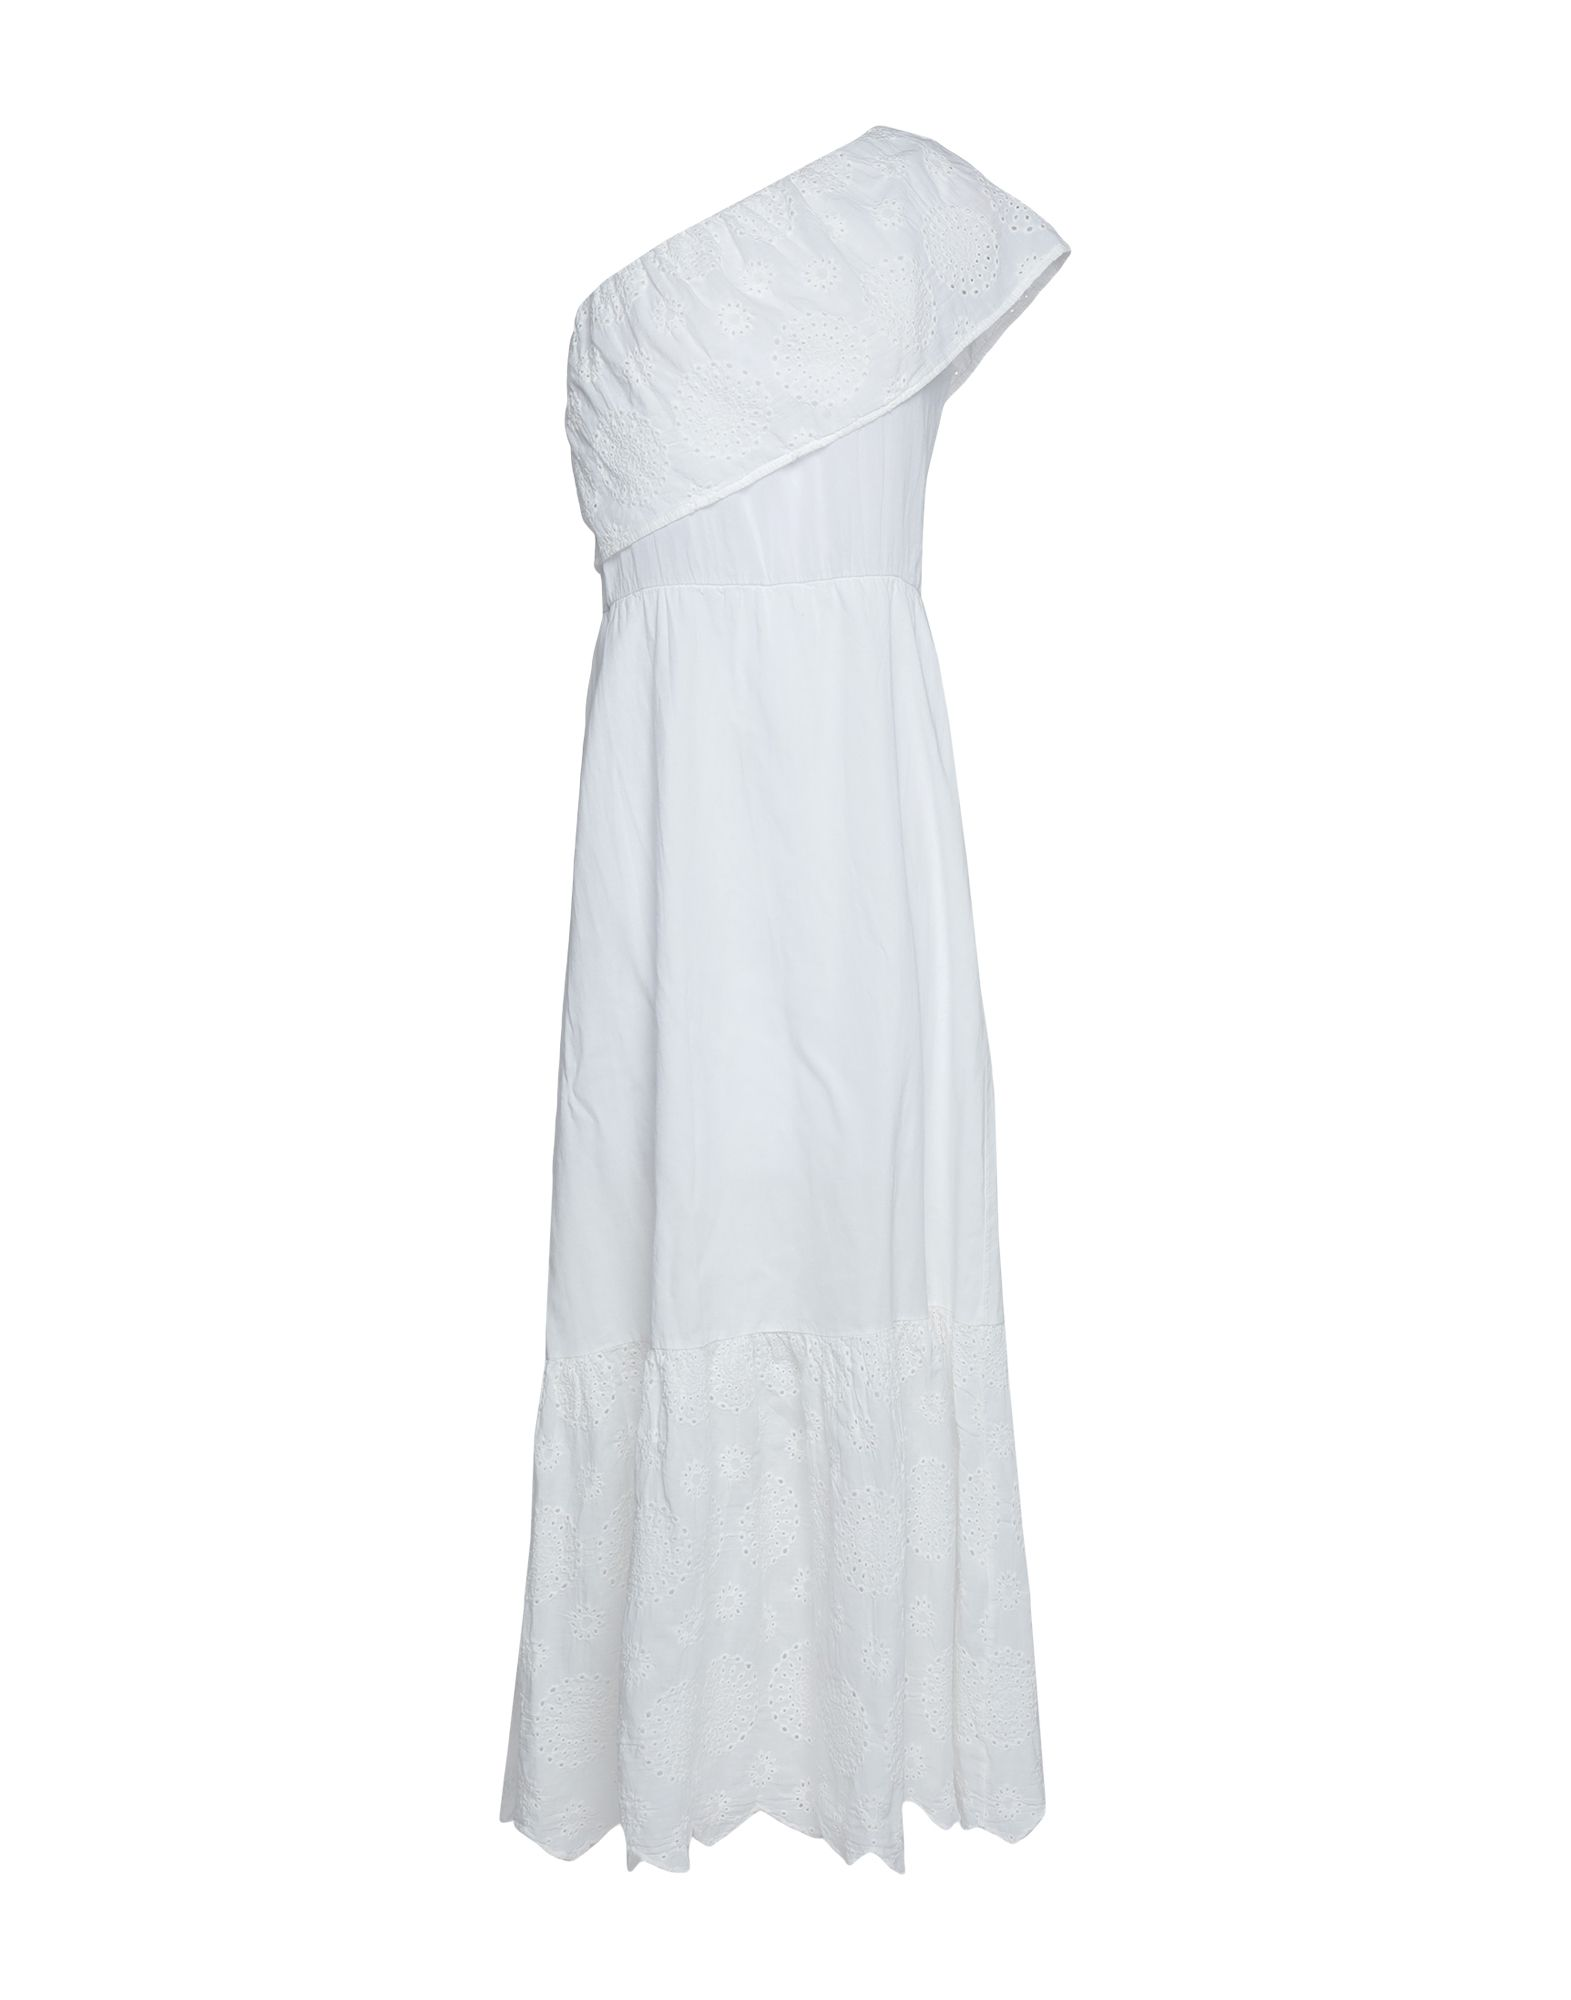 KATE BY LALTRAMODA Длинное платье